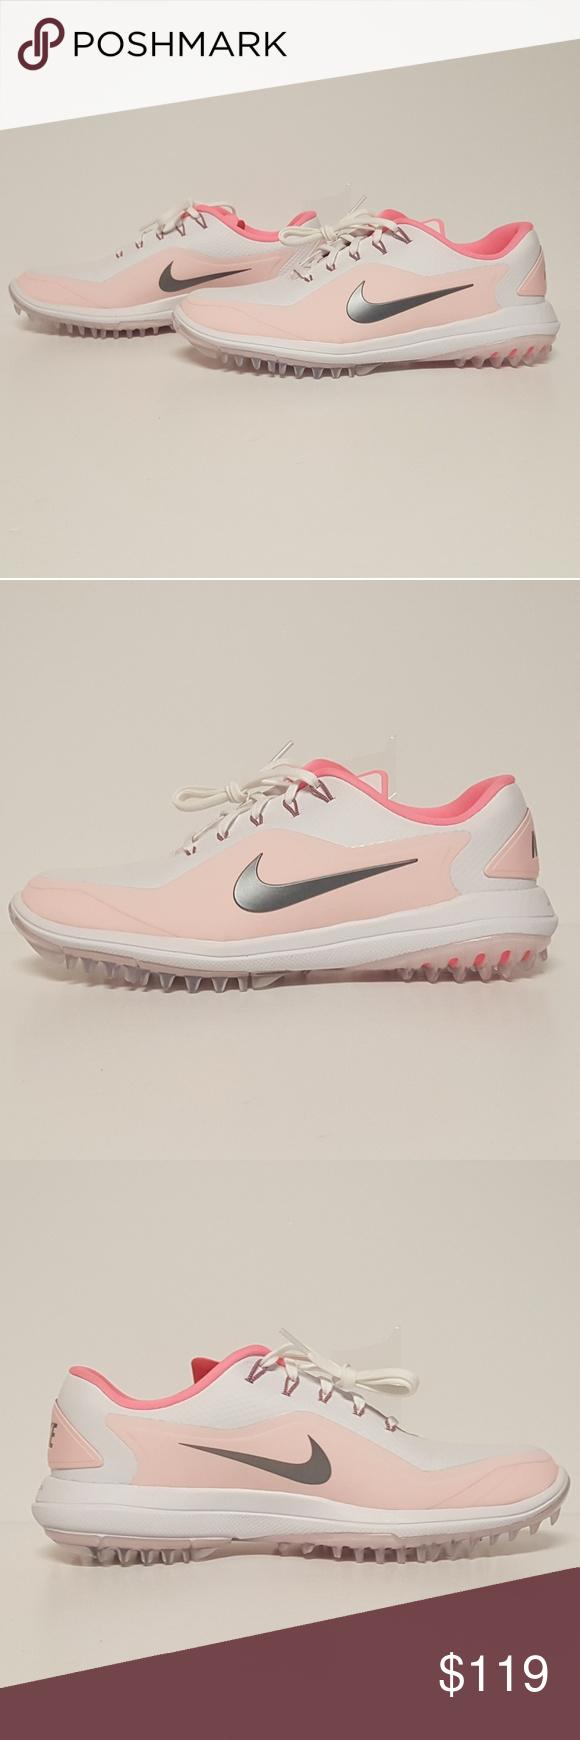 wholesale dealer 1e4f8 3e64b Nike Womens Lunar Control Vapor 2 Golf Shoes Pink Up for grabs are the Nike  Lunar